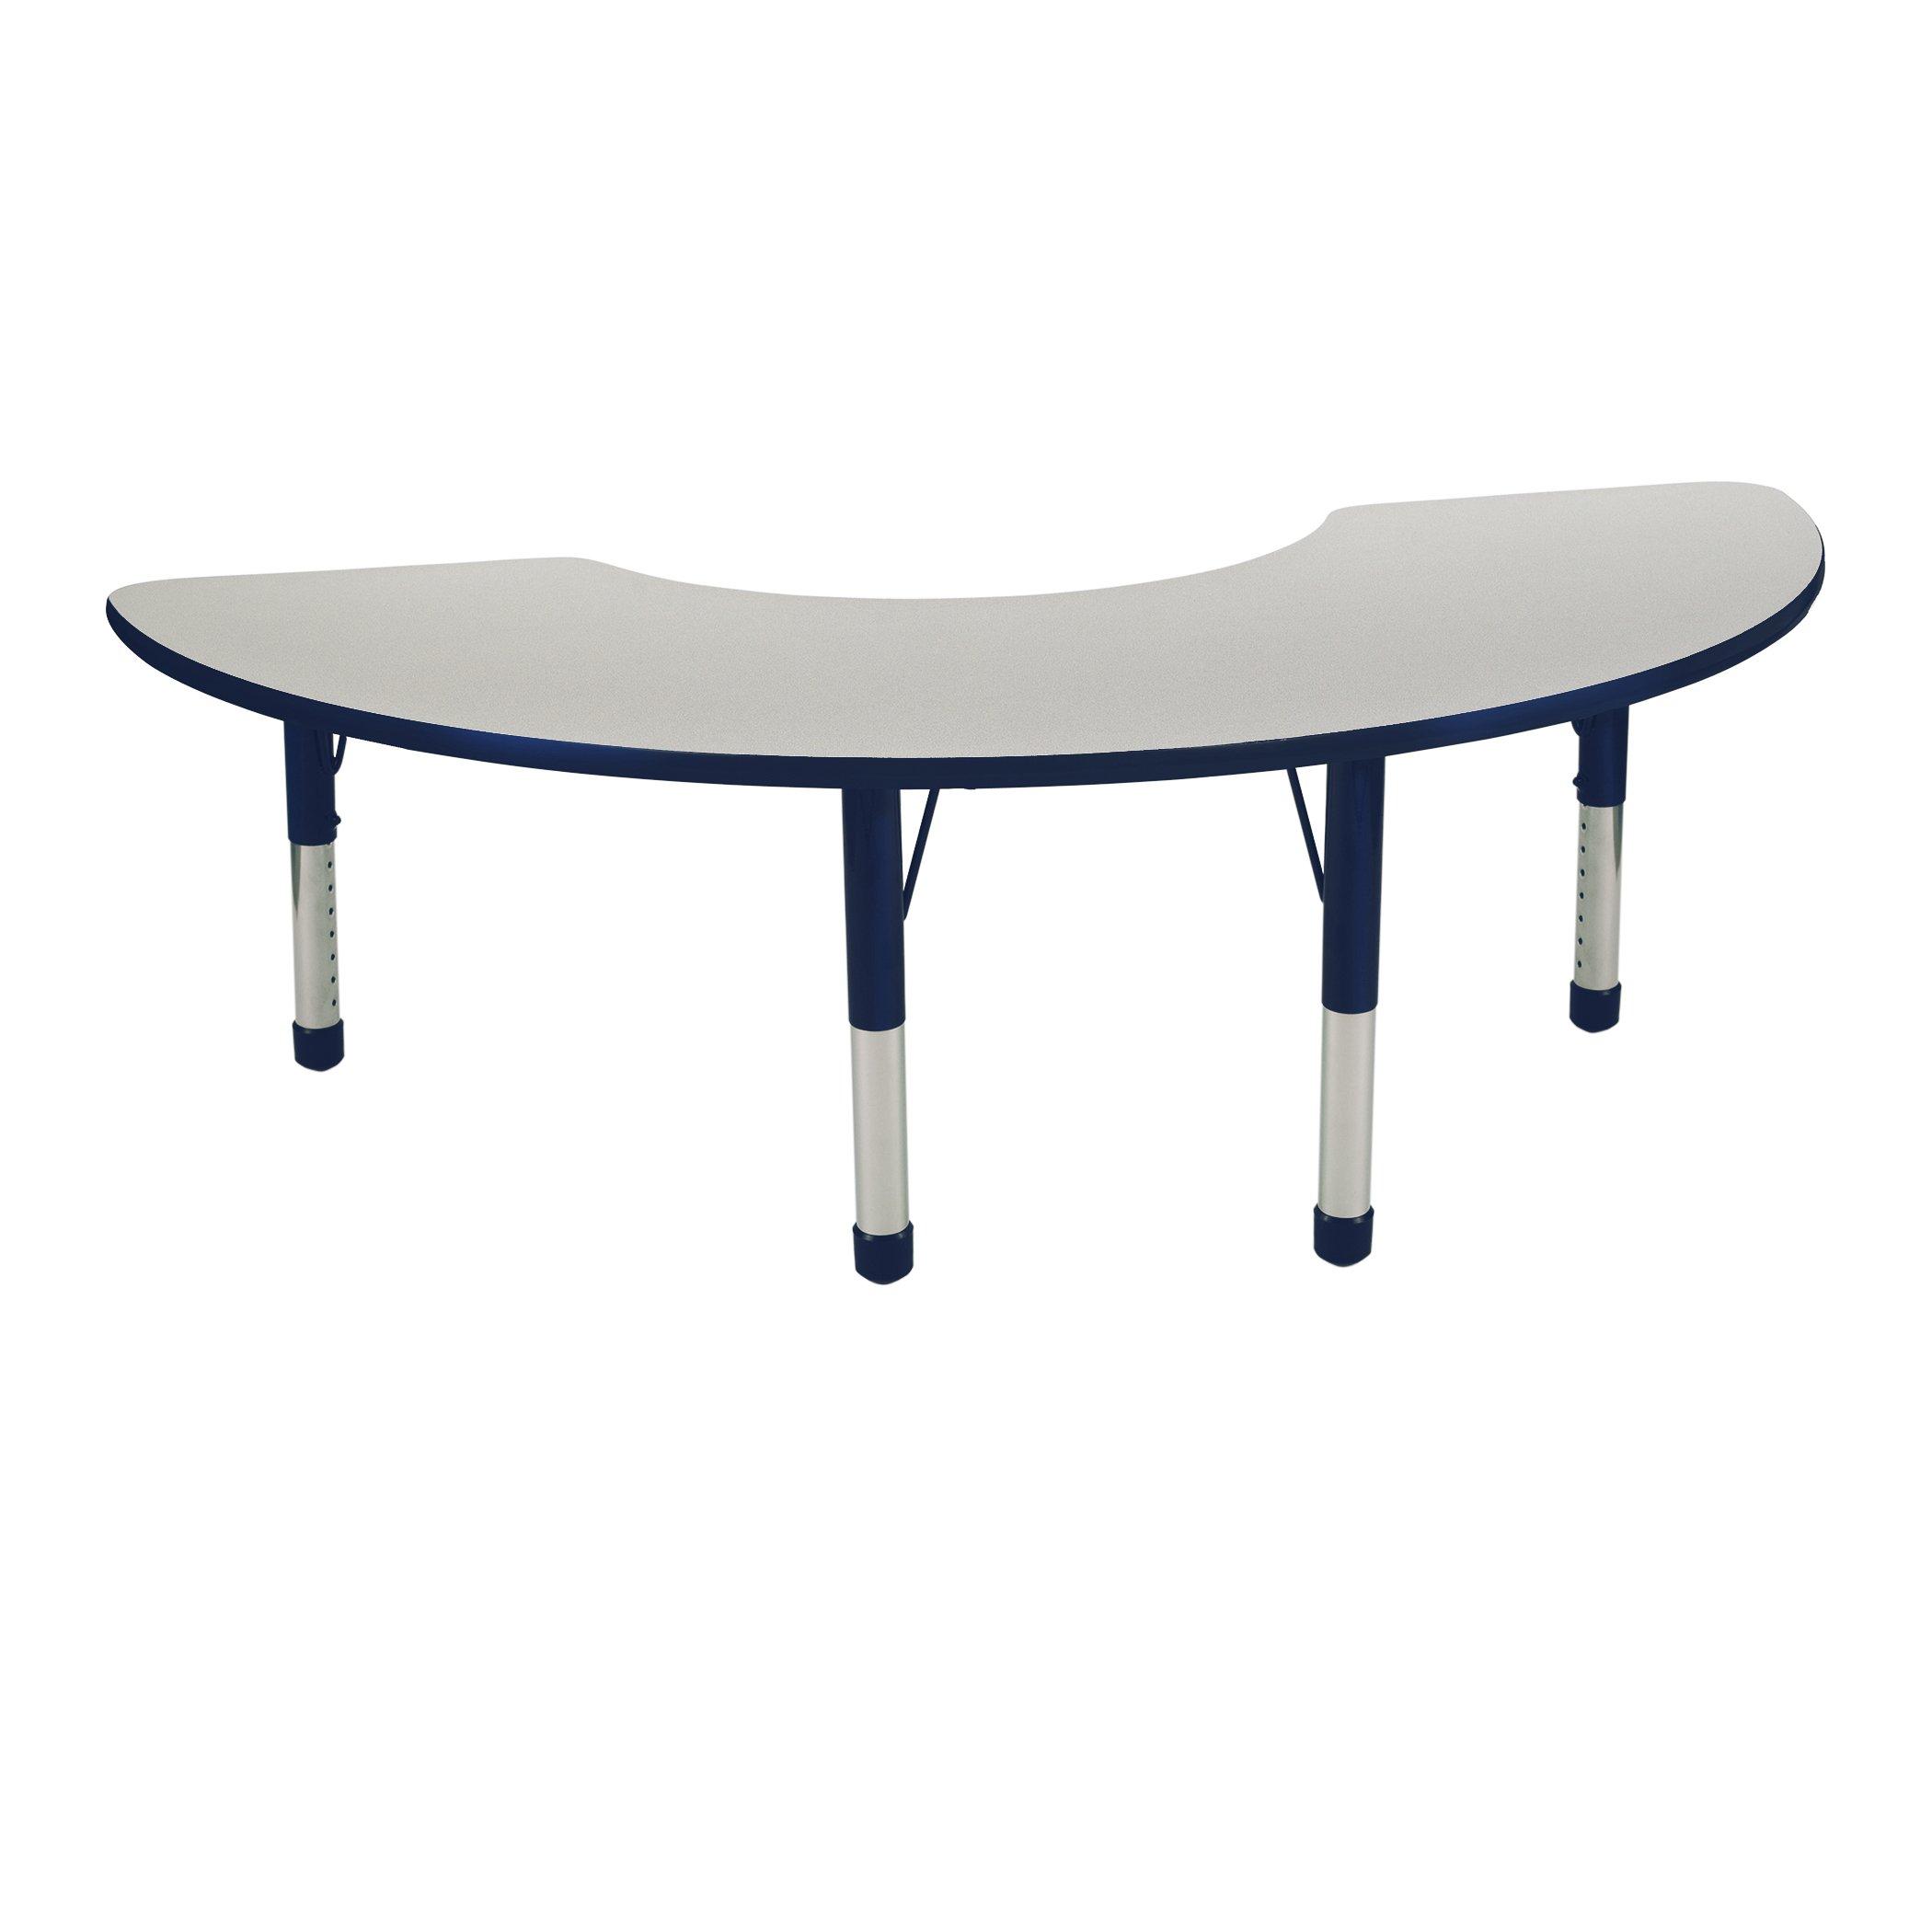 ECR4Kids 36'' x 72'' Half Moon Activty School Table, Chunky Legs, Adjustable Height 15-24 inch (Grey/Navy)